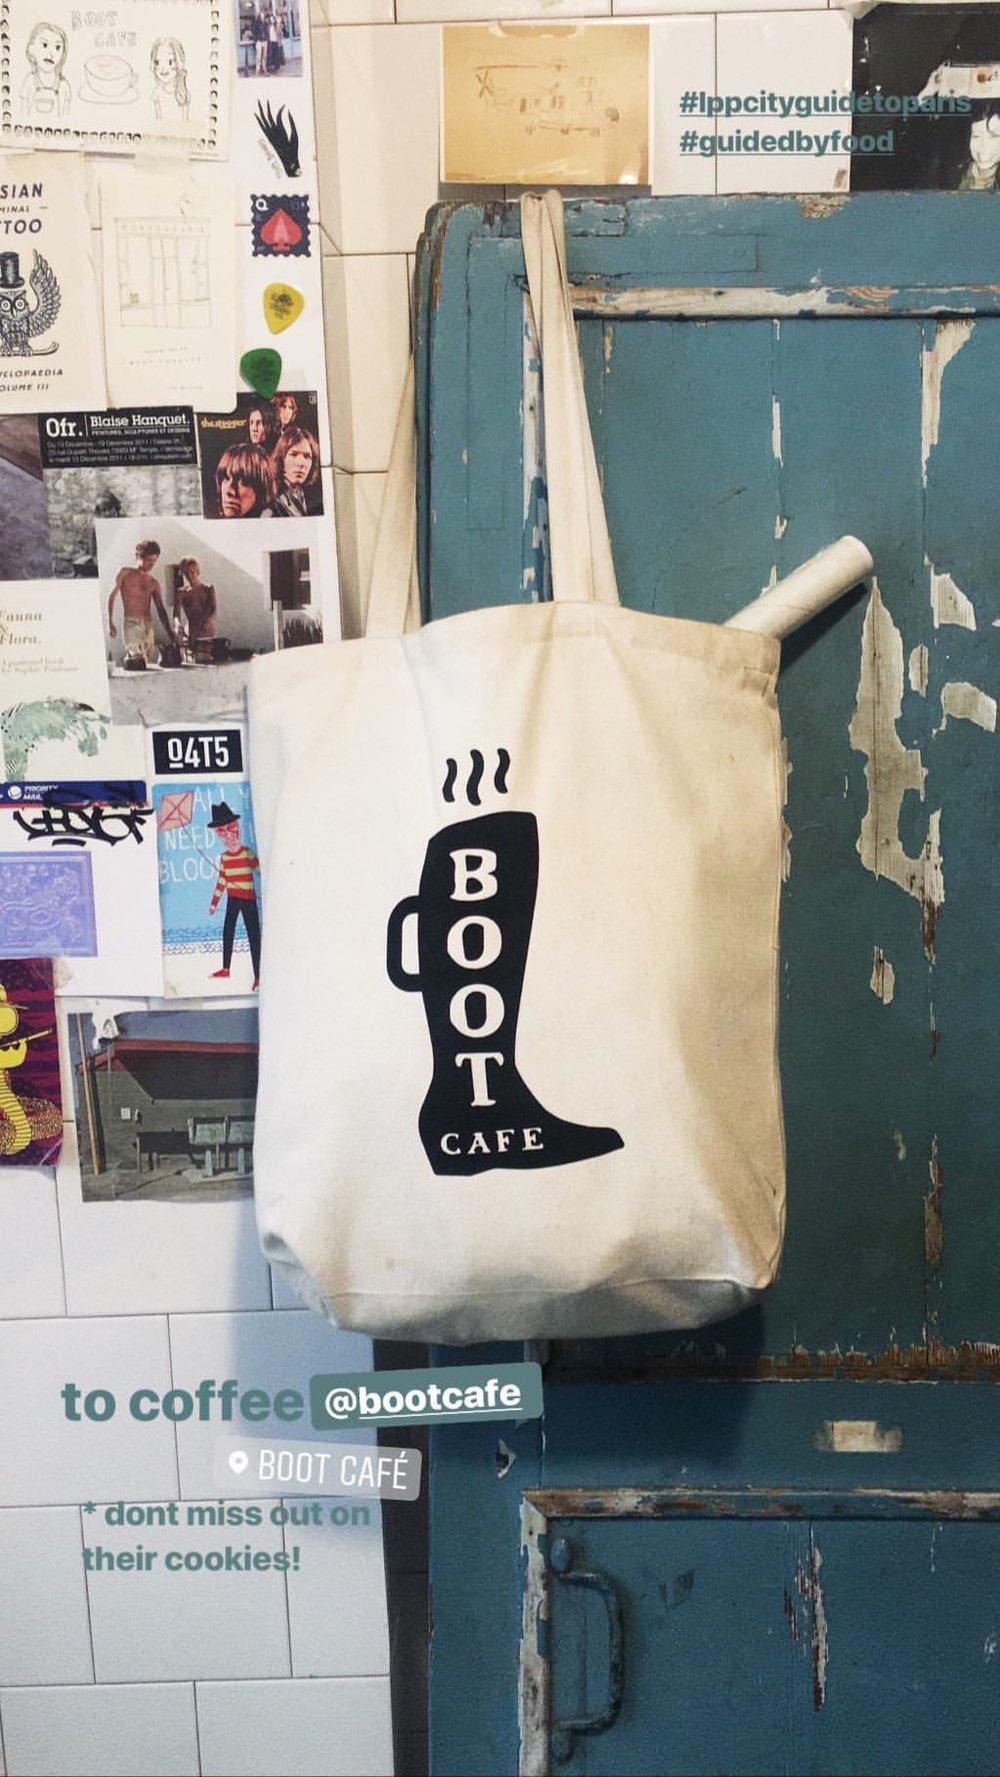 PARIS-FOOD-BOOTCAFE-COFFEE-2.jpg